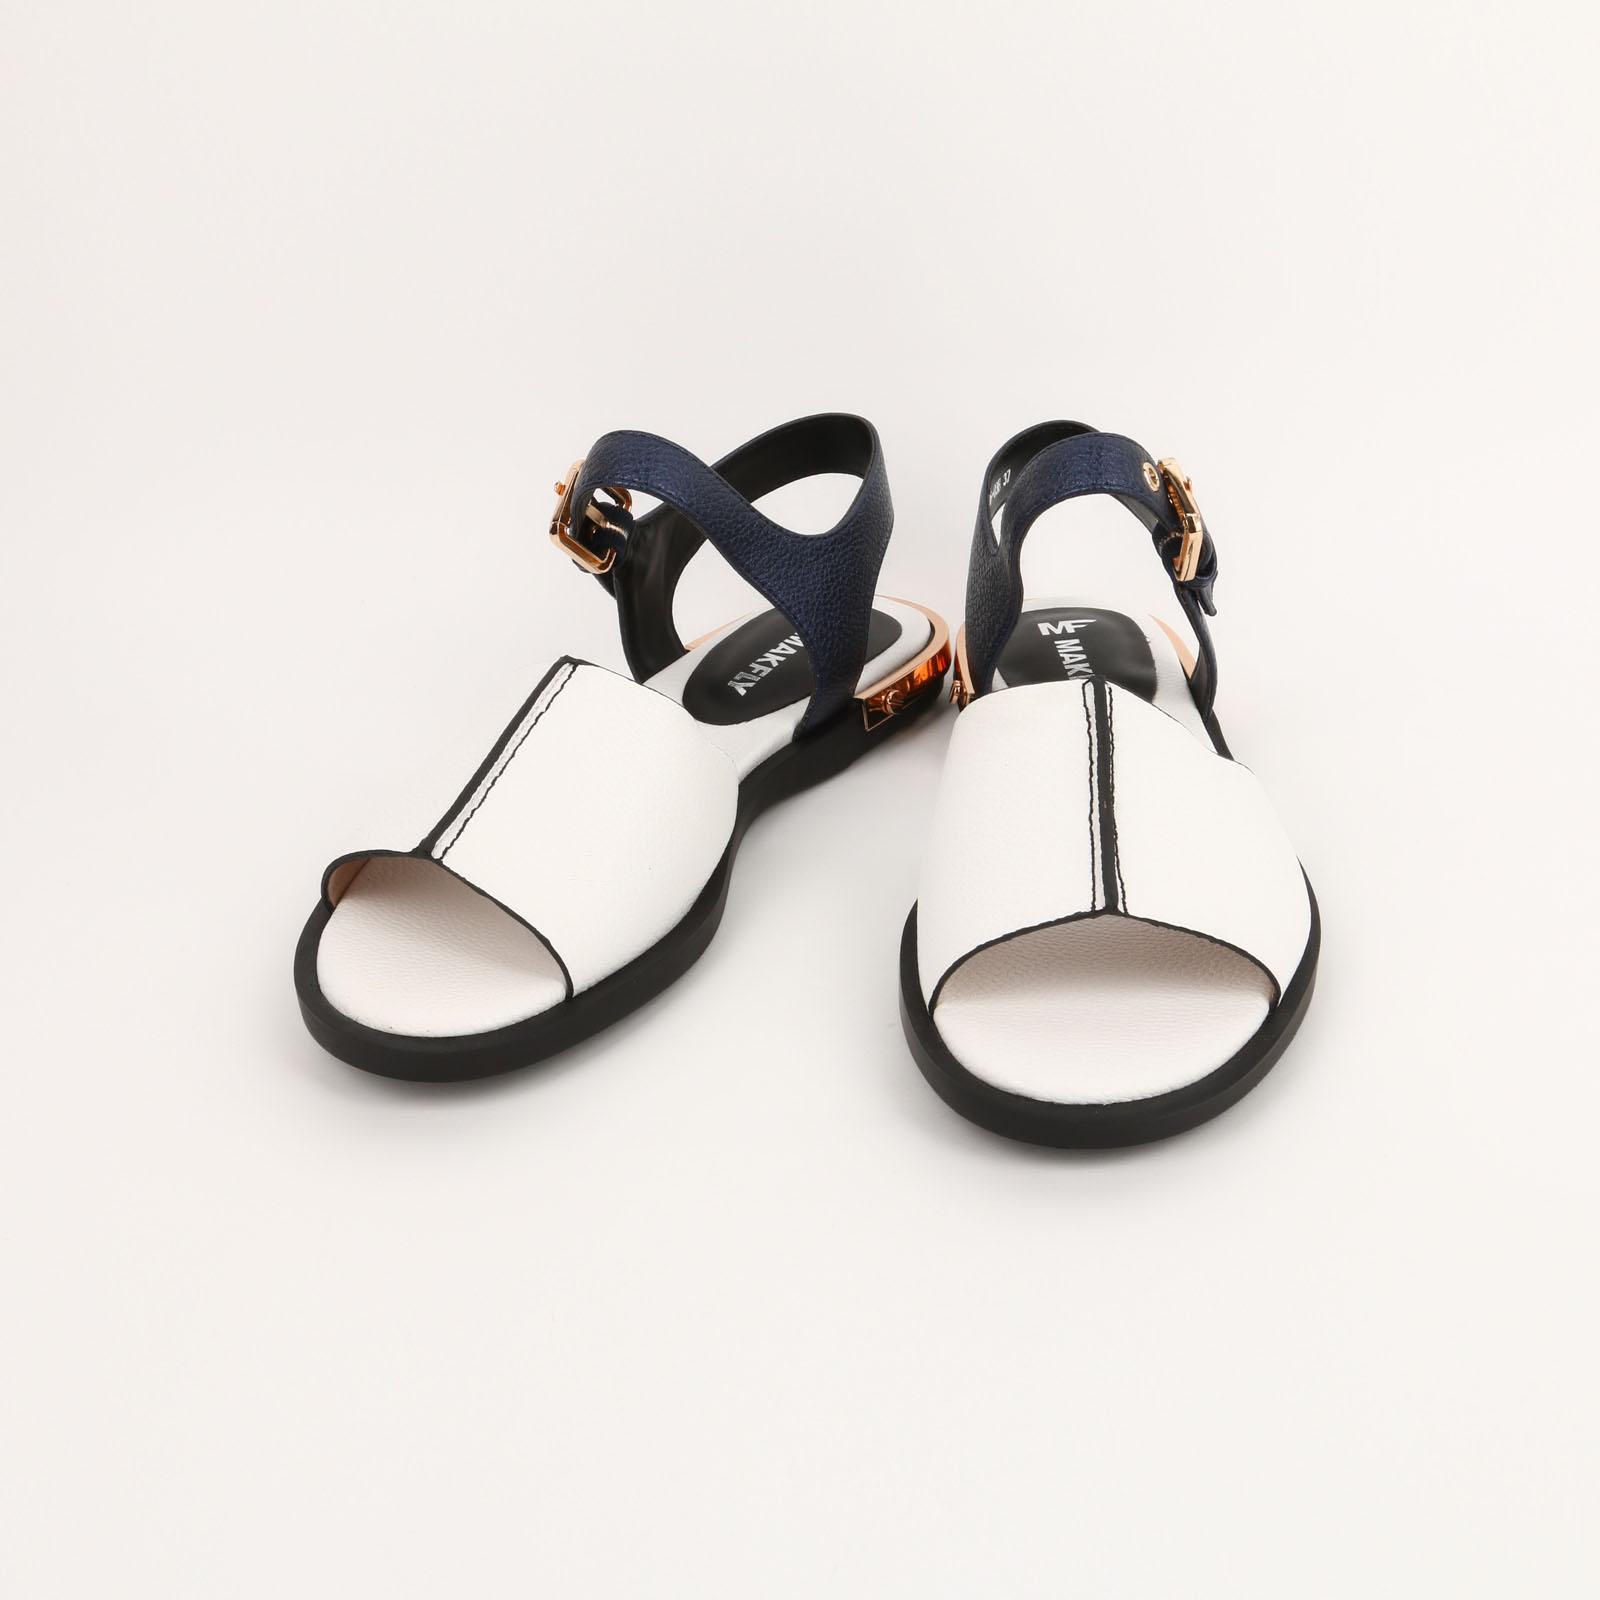 Босоножки с украшением на каблуке